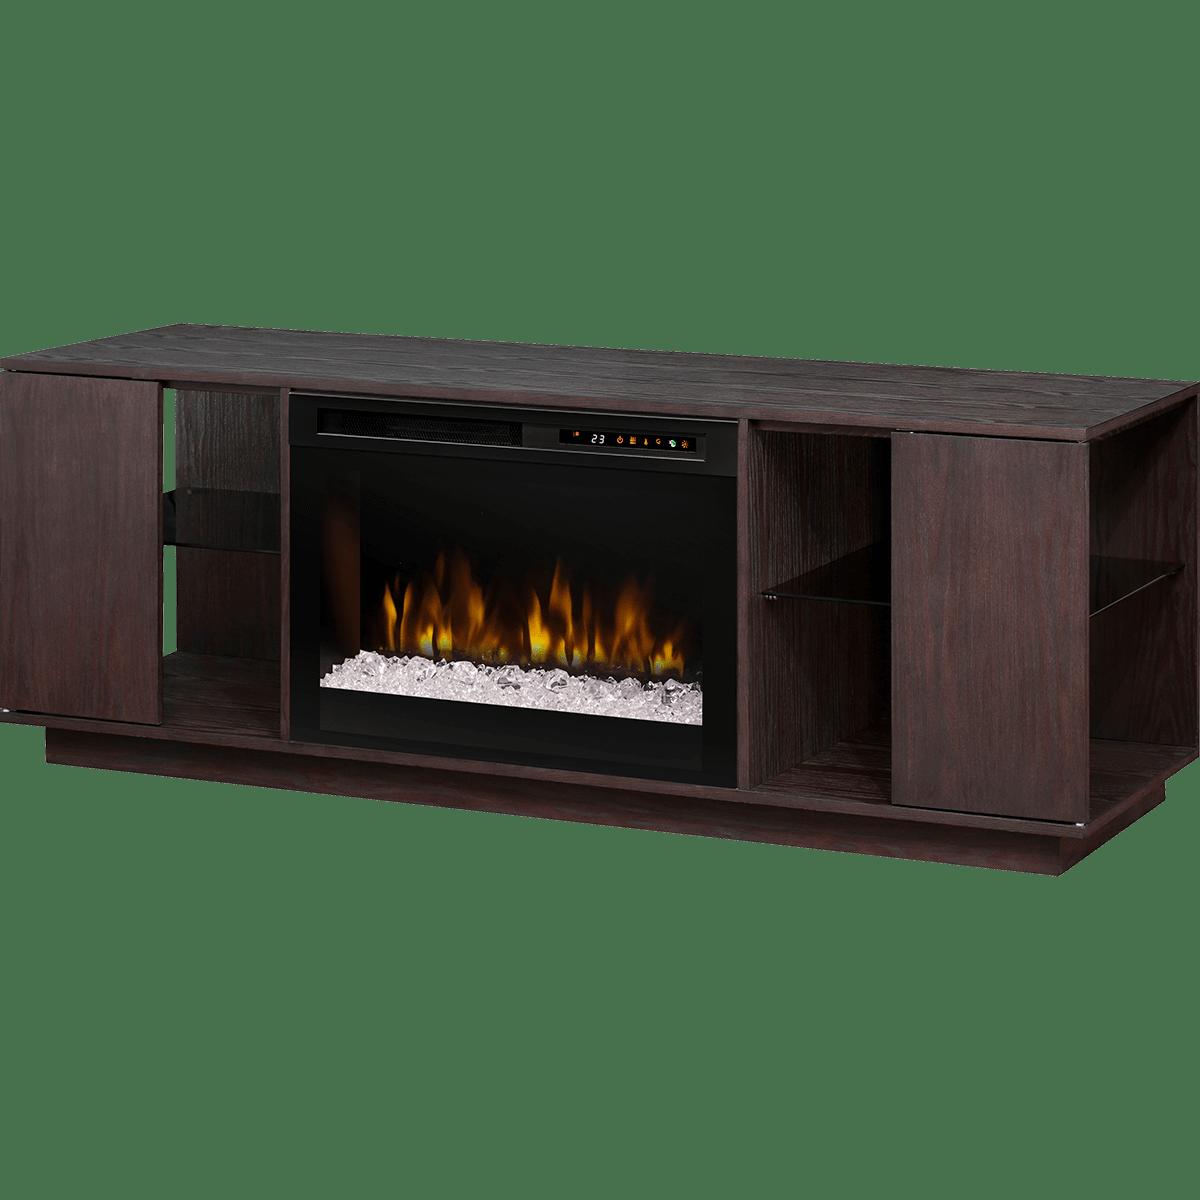 Dimplex Flex Lex Media Console Electric Fireplace